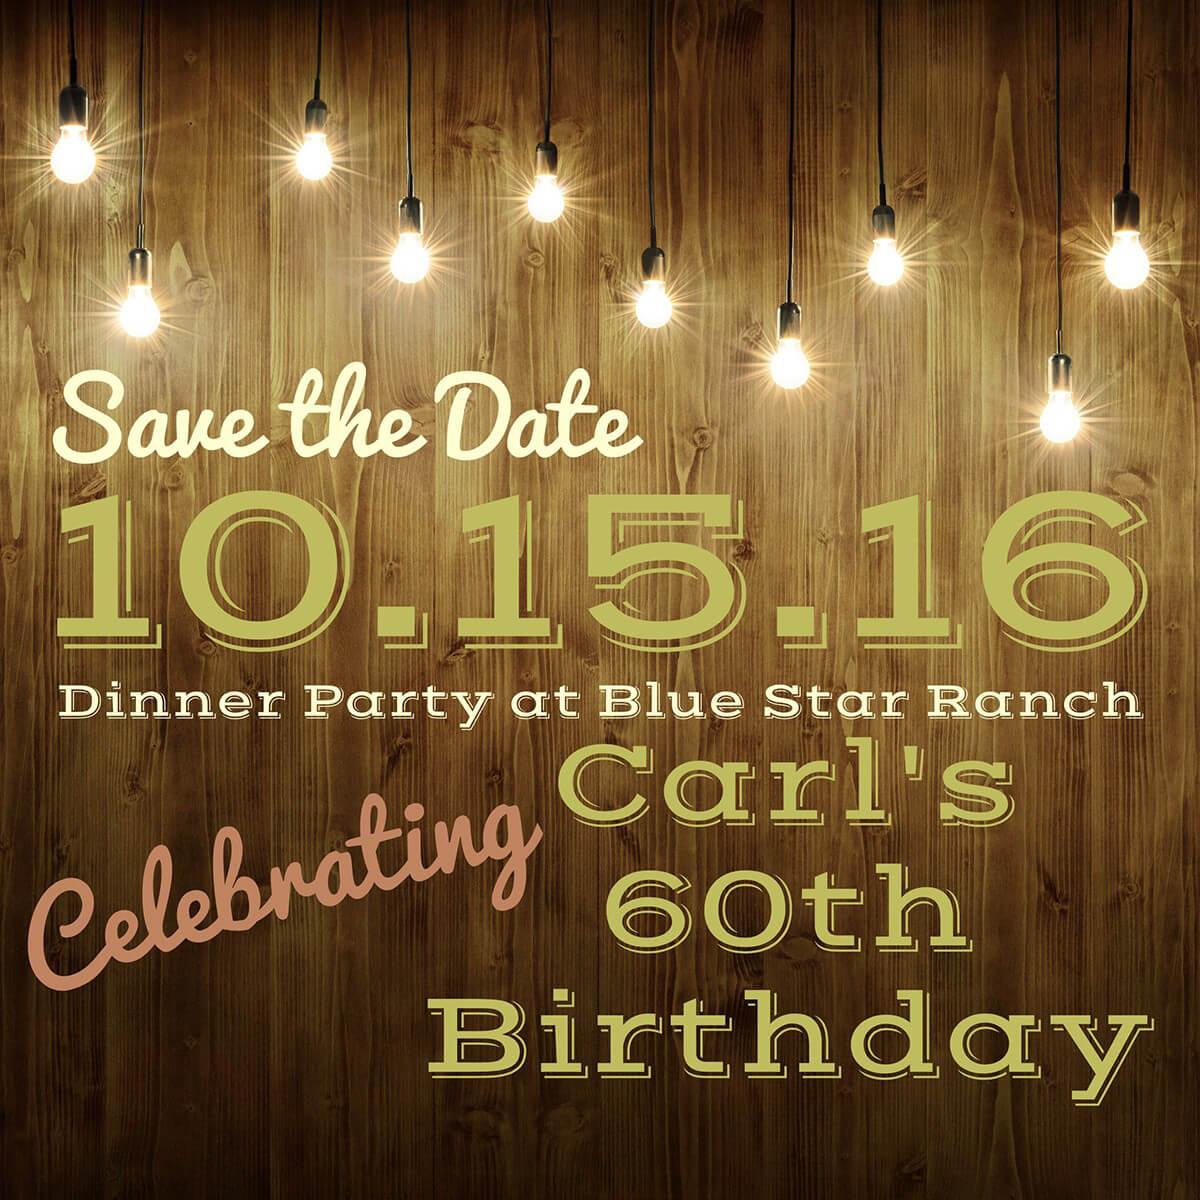 Invitation Maker: Create Invitations For Free | Adobe Spark - Free Printable Save The Date Birthday Invitations